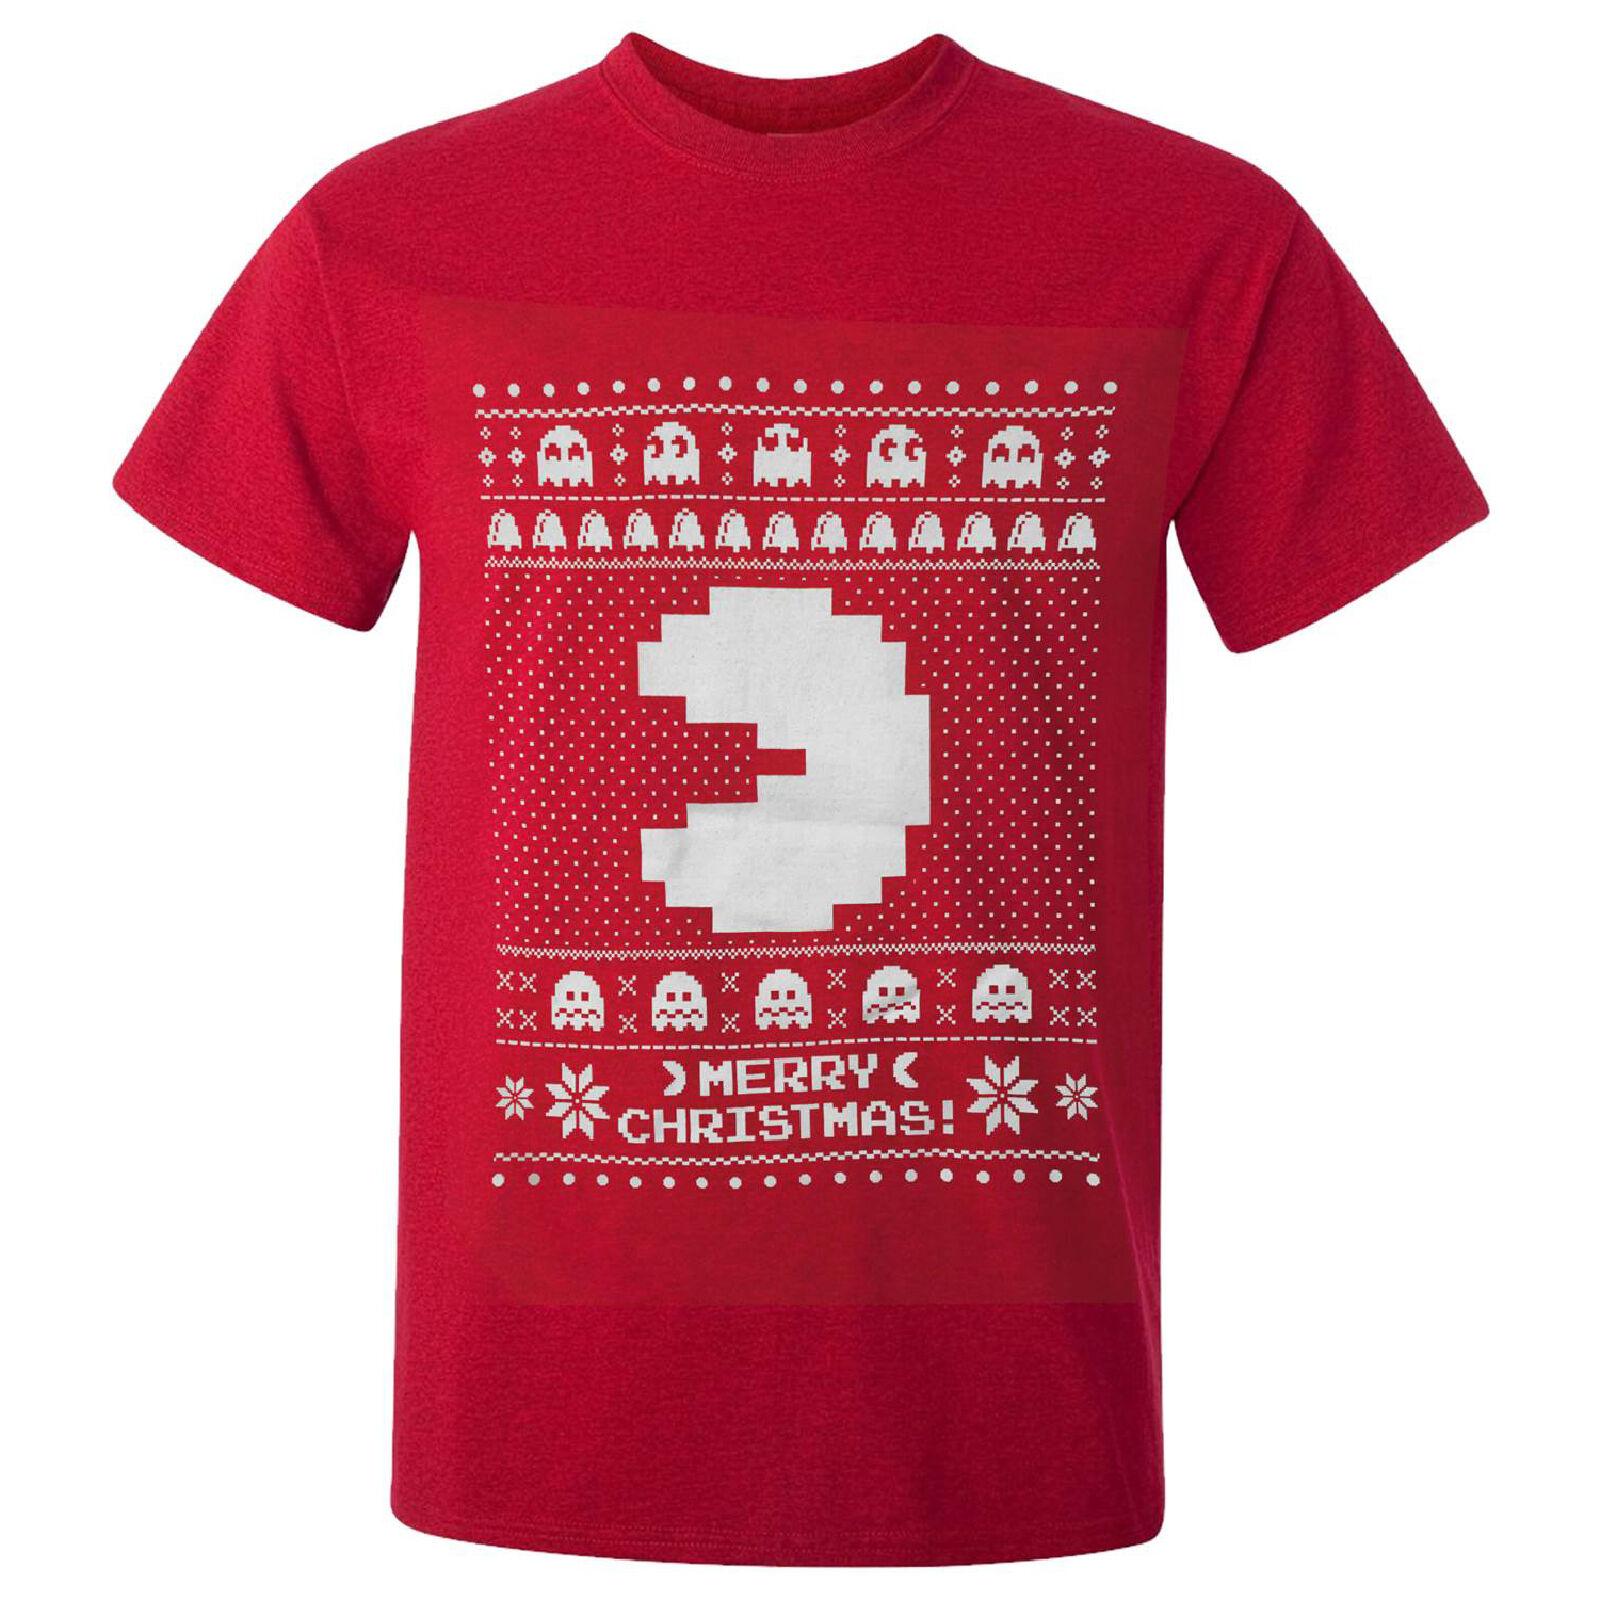 Geek Clothing Namco Men's Merry Pac-Man Christmas T-Shirt - Red - XL - Red